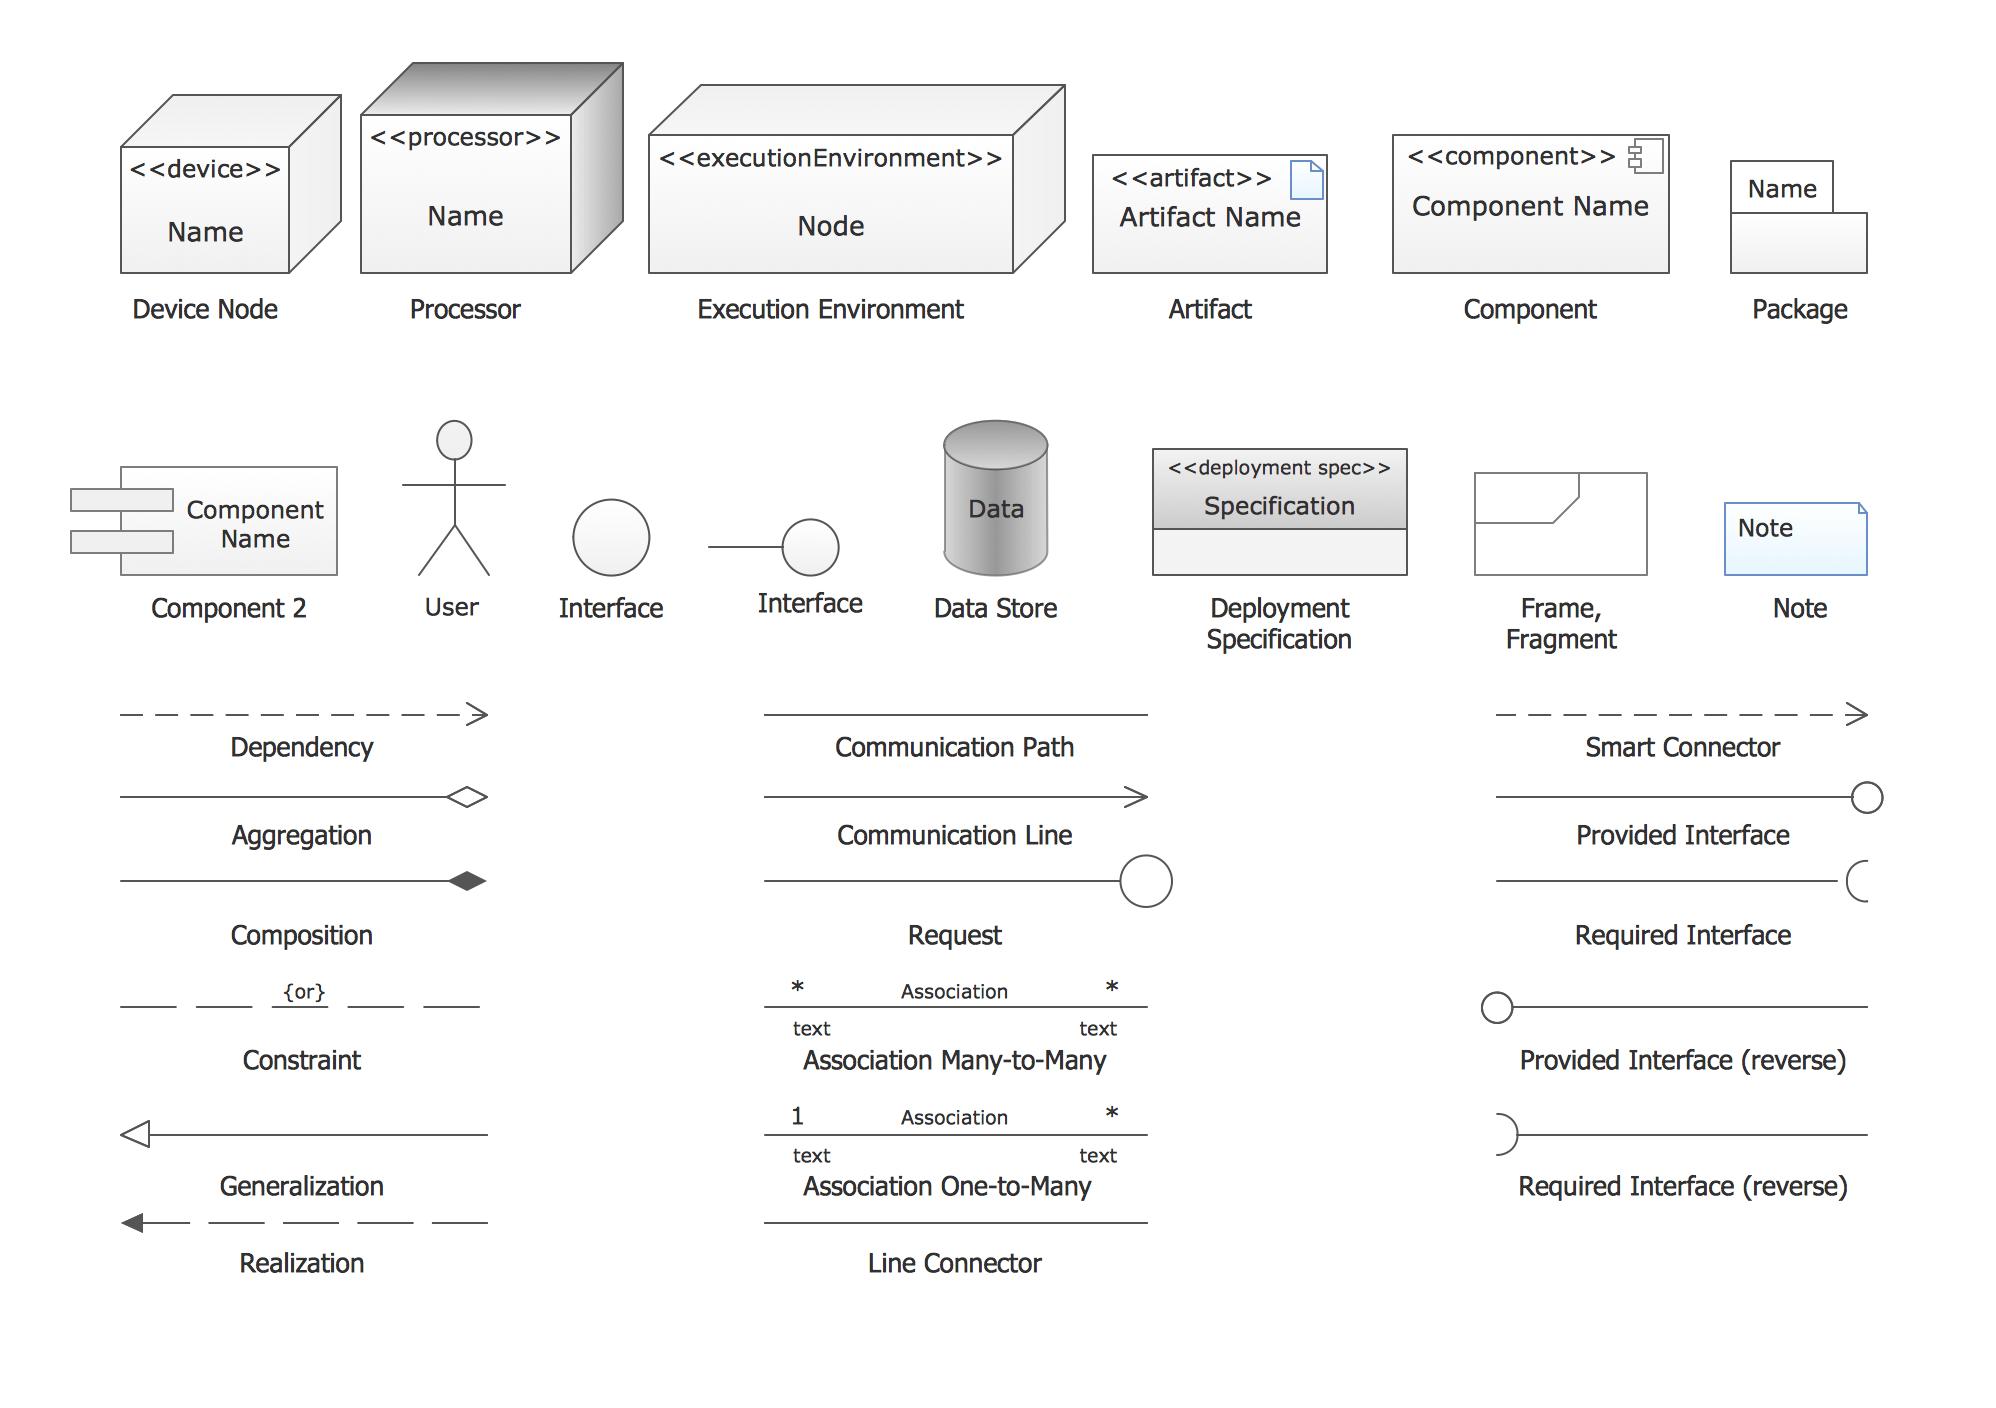 9 uml diagrams for library management system hormonal acne diagram technology manoharprasad digitalmarketing